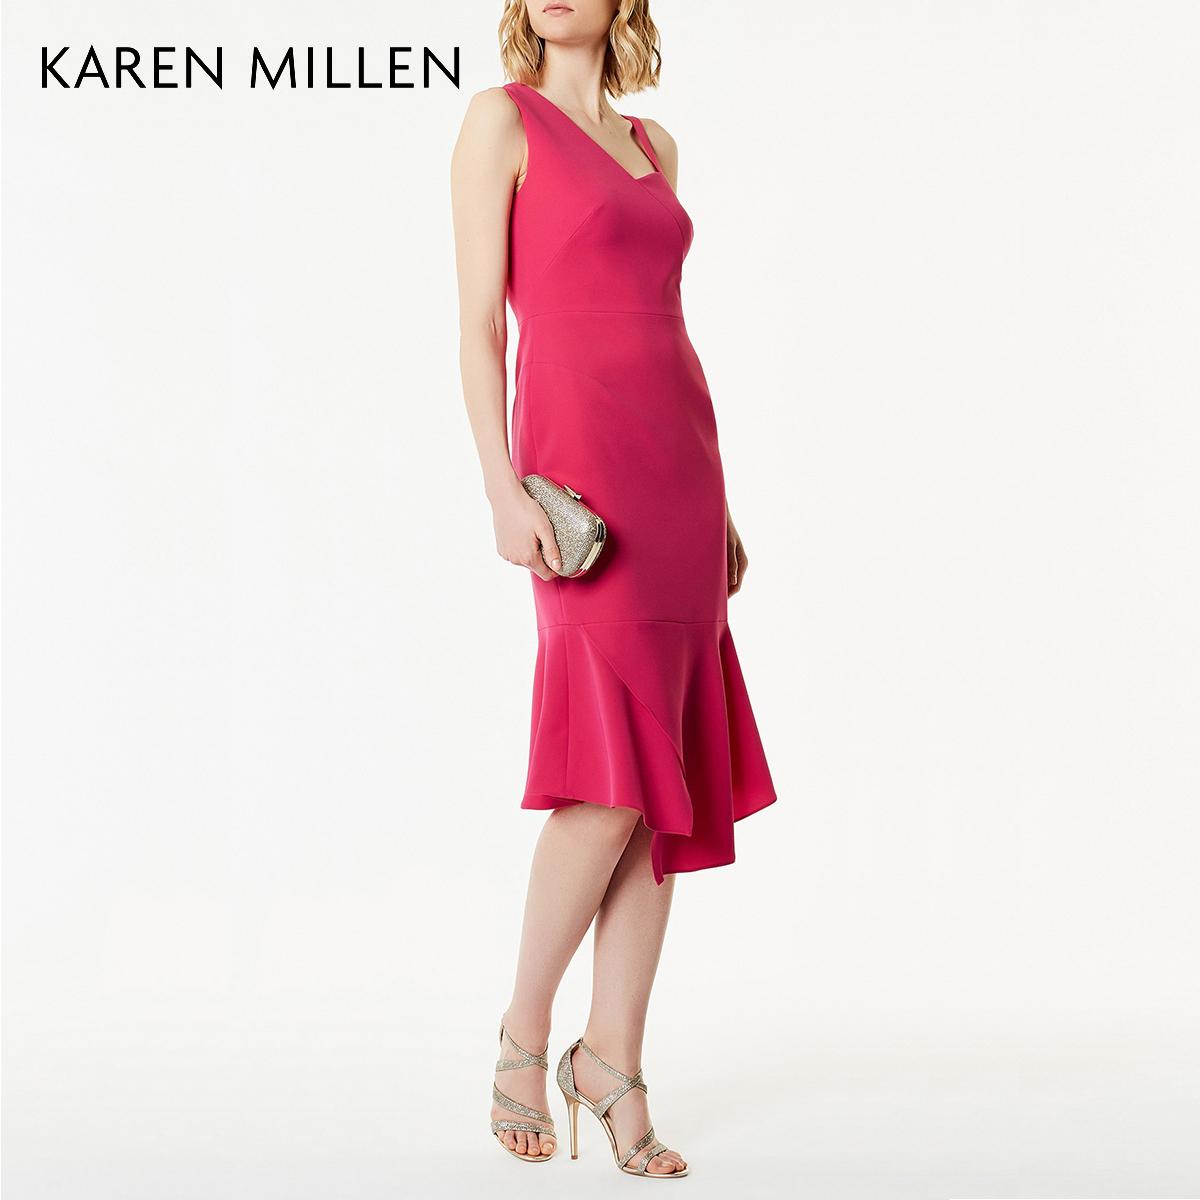 KAREN MILLEN凯伦米莲英伦女装2018夏纯色荷叶摆连衣裙KM5182A702